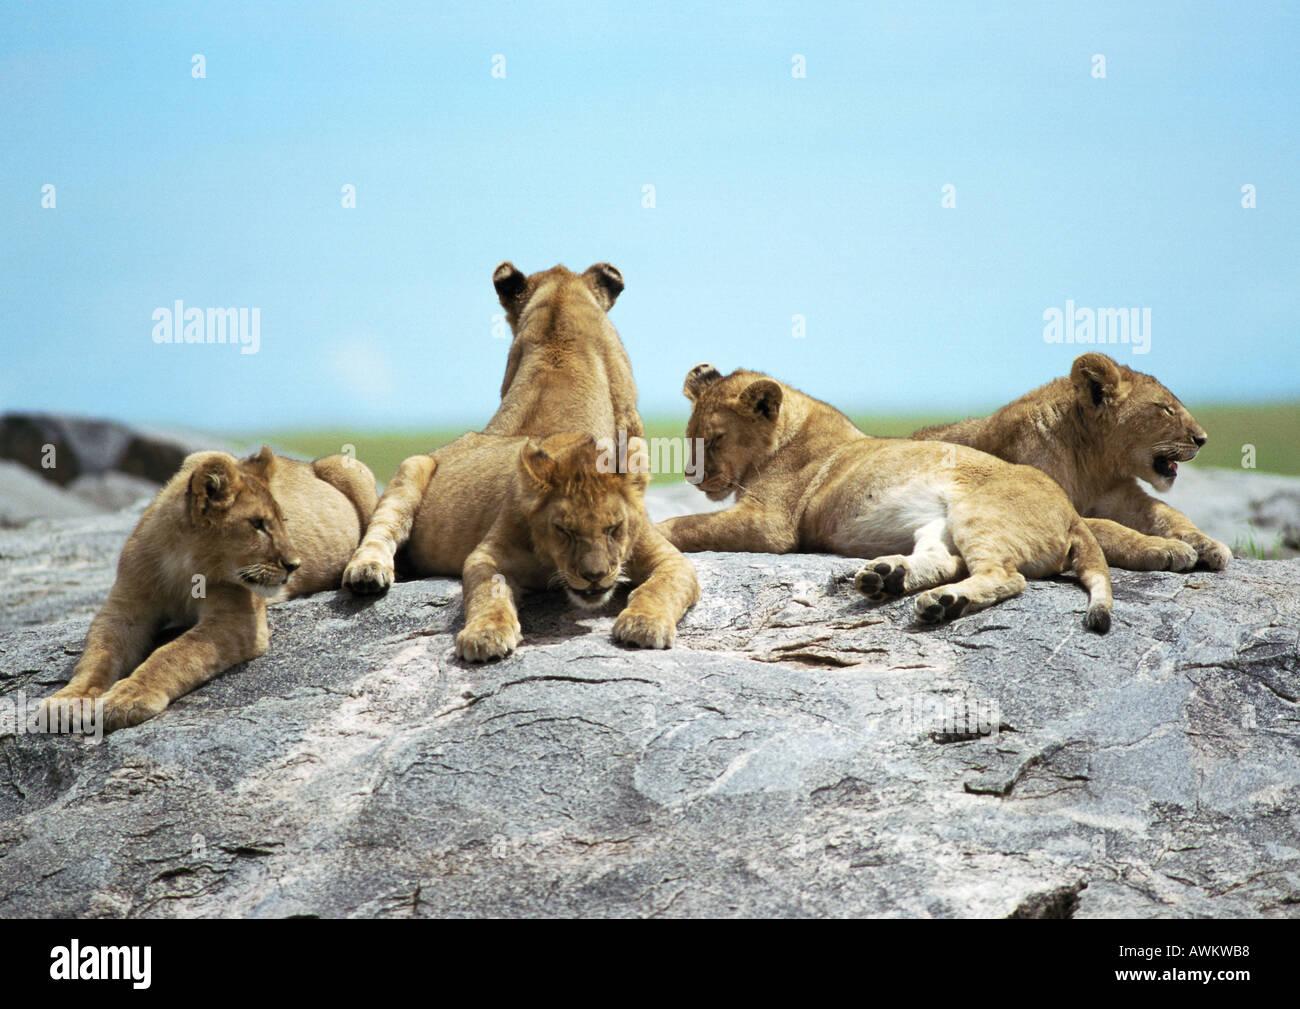 Lion cubs (Panthera leo) giacente su roccia Immagini Stock